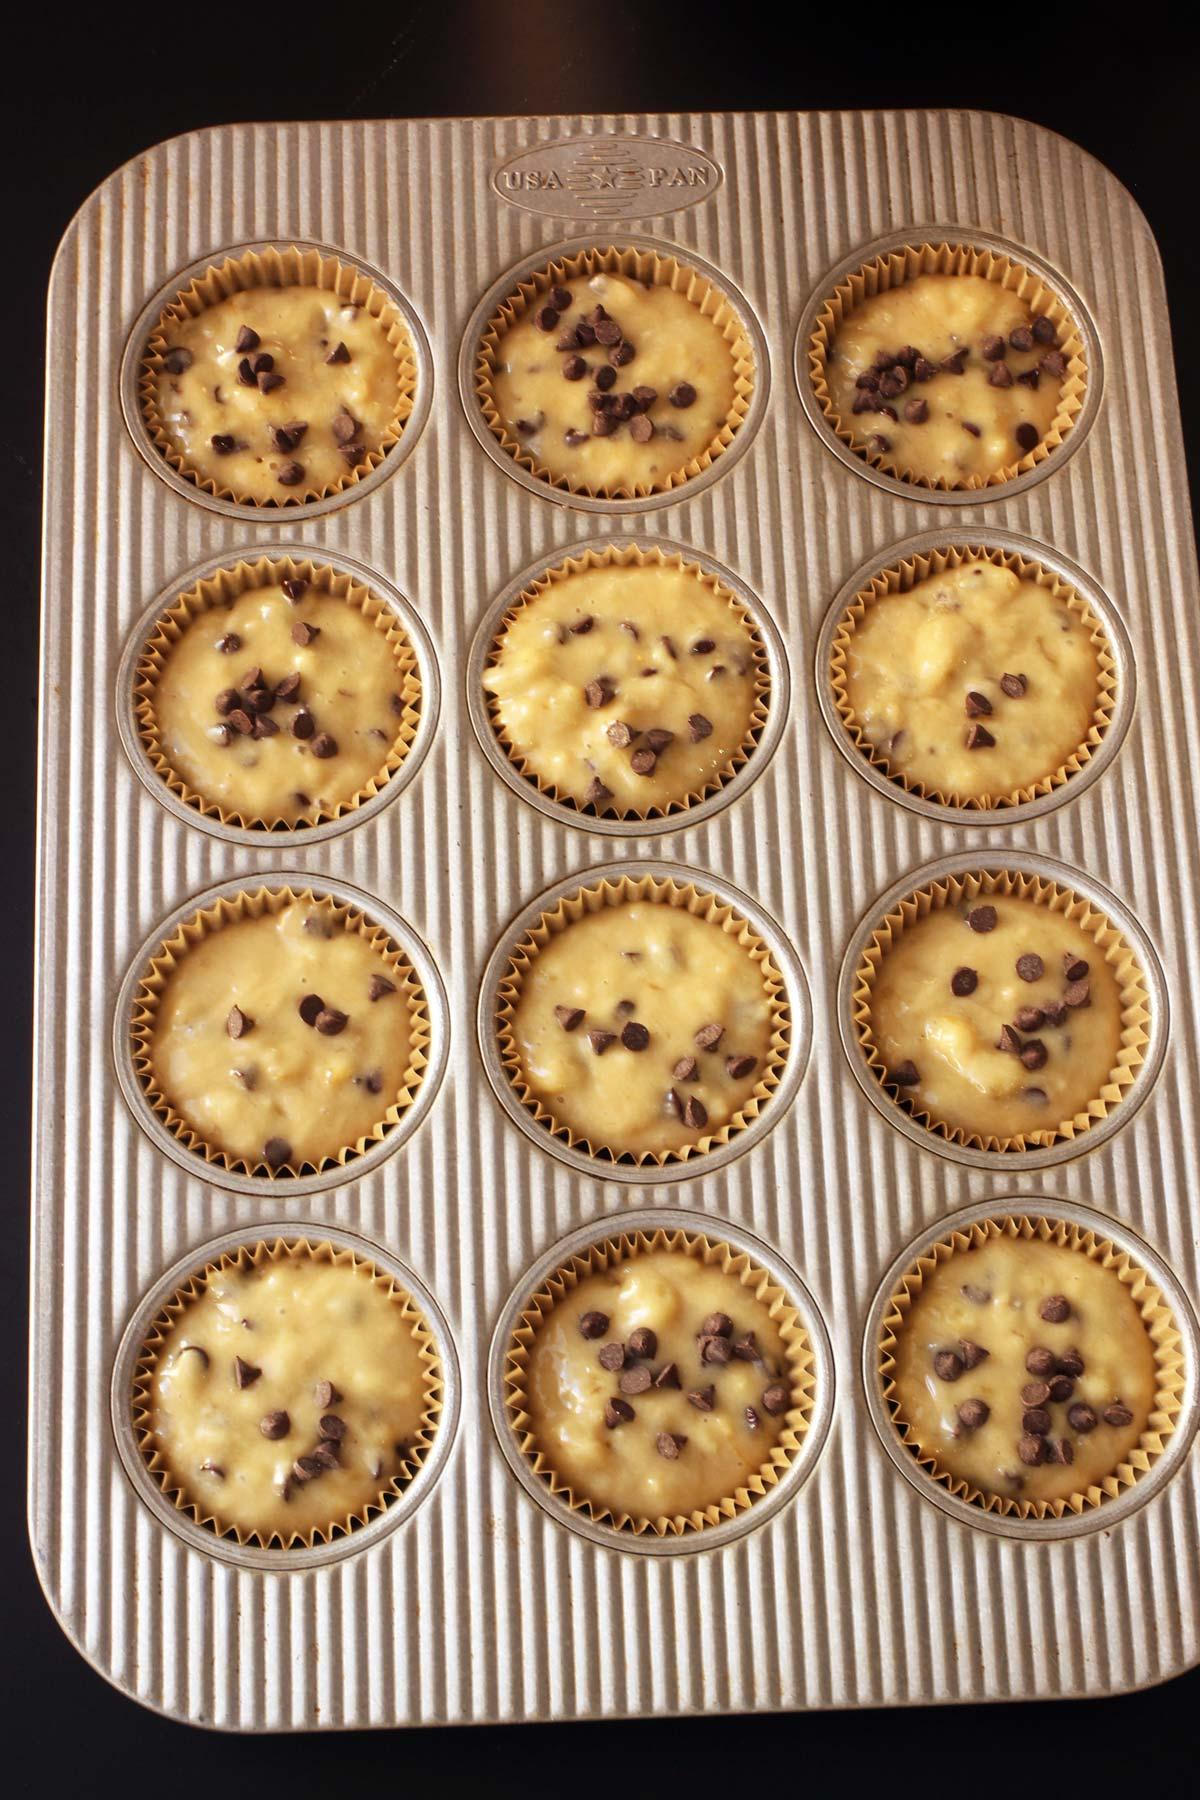 muffin batter in usa pan